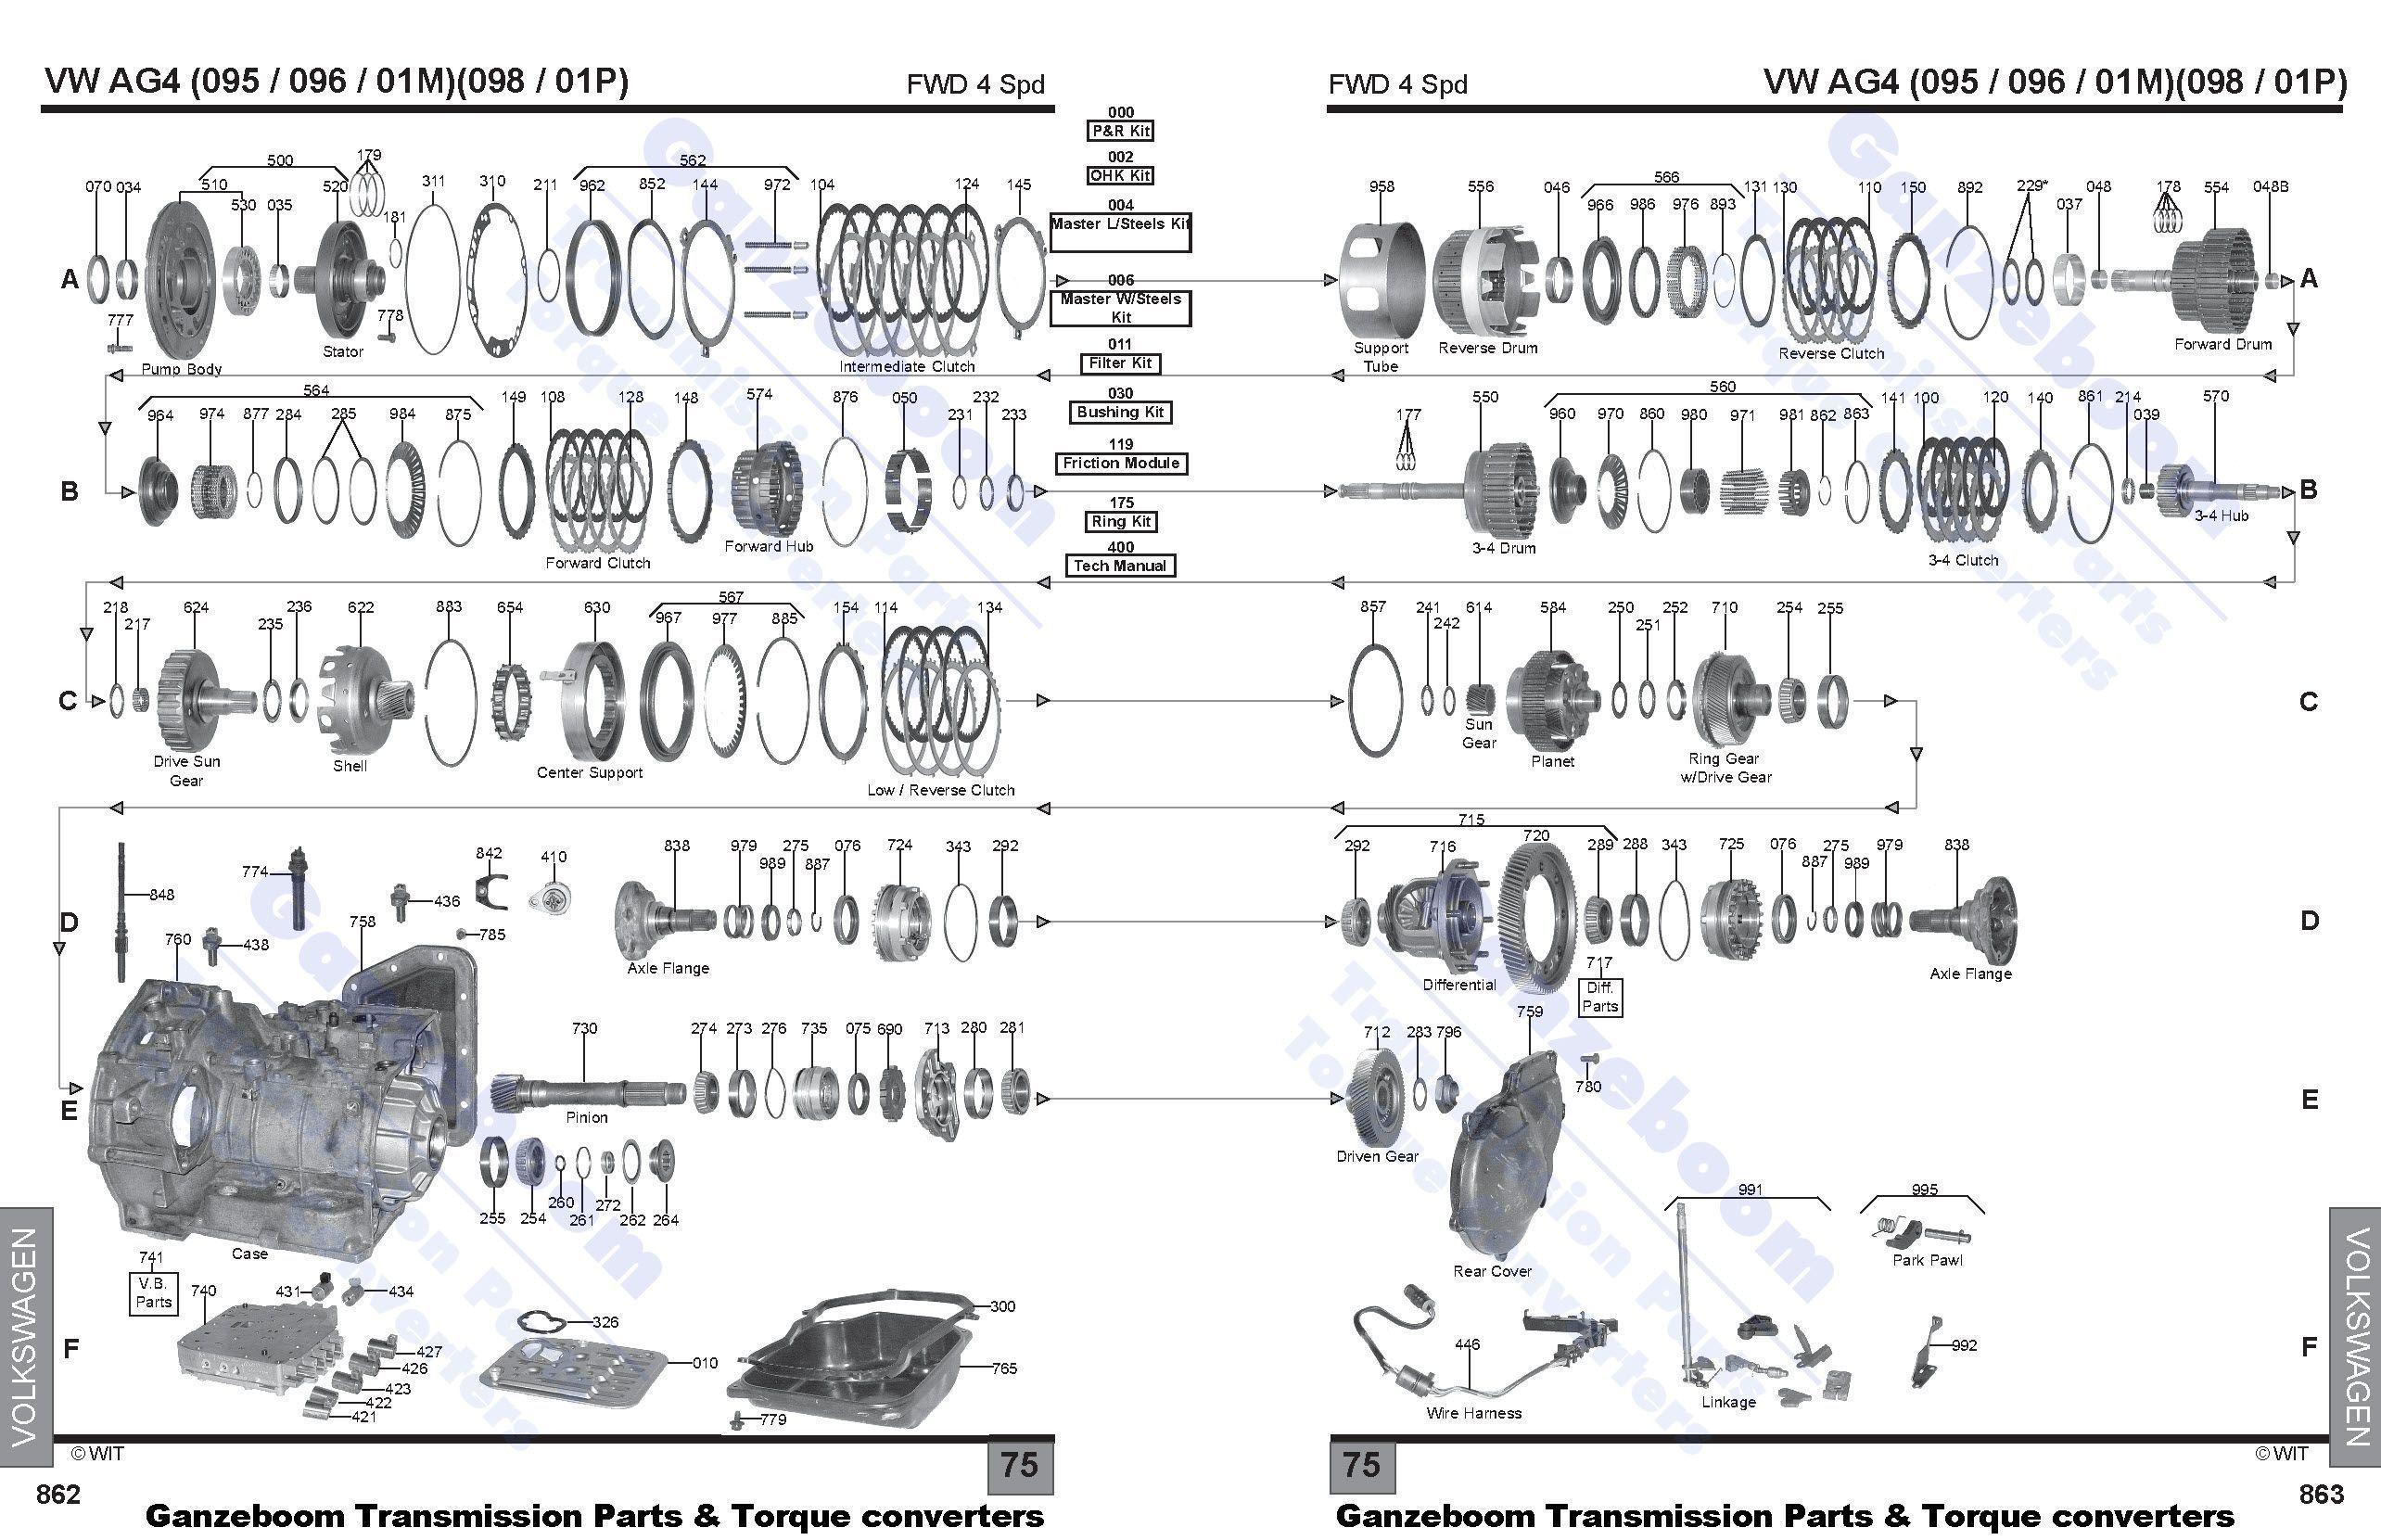 columbia step ballast wiring diagram bd 4877  computer circuit board stock photo c bradcalkins 8682622  circuit board stock photo c bradcalkins